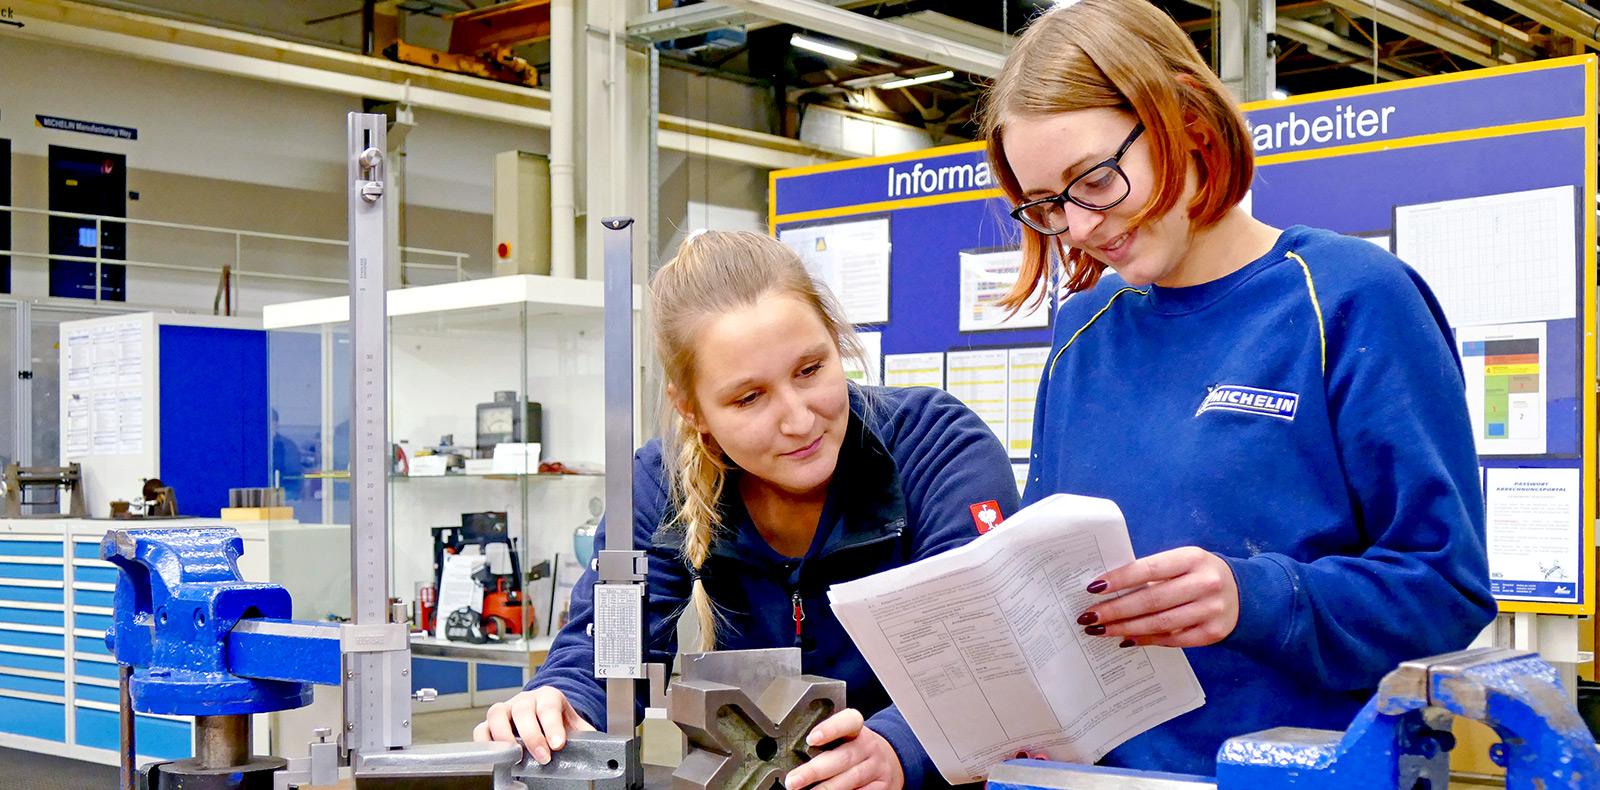 Promoting industrial jobs